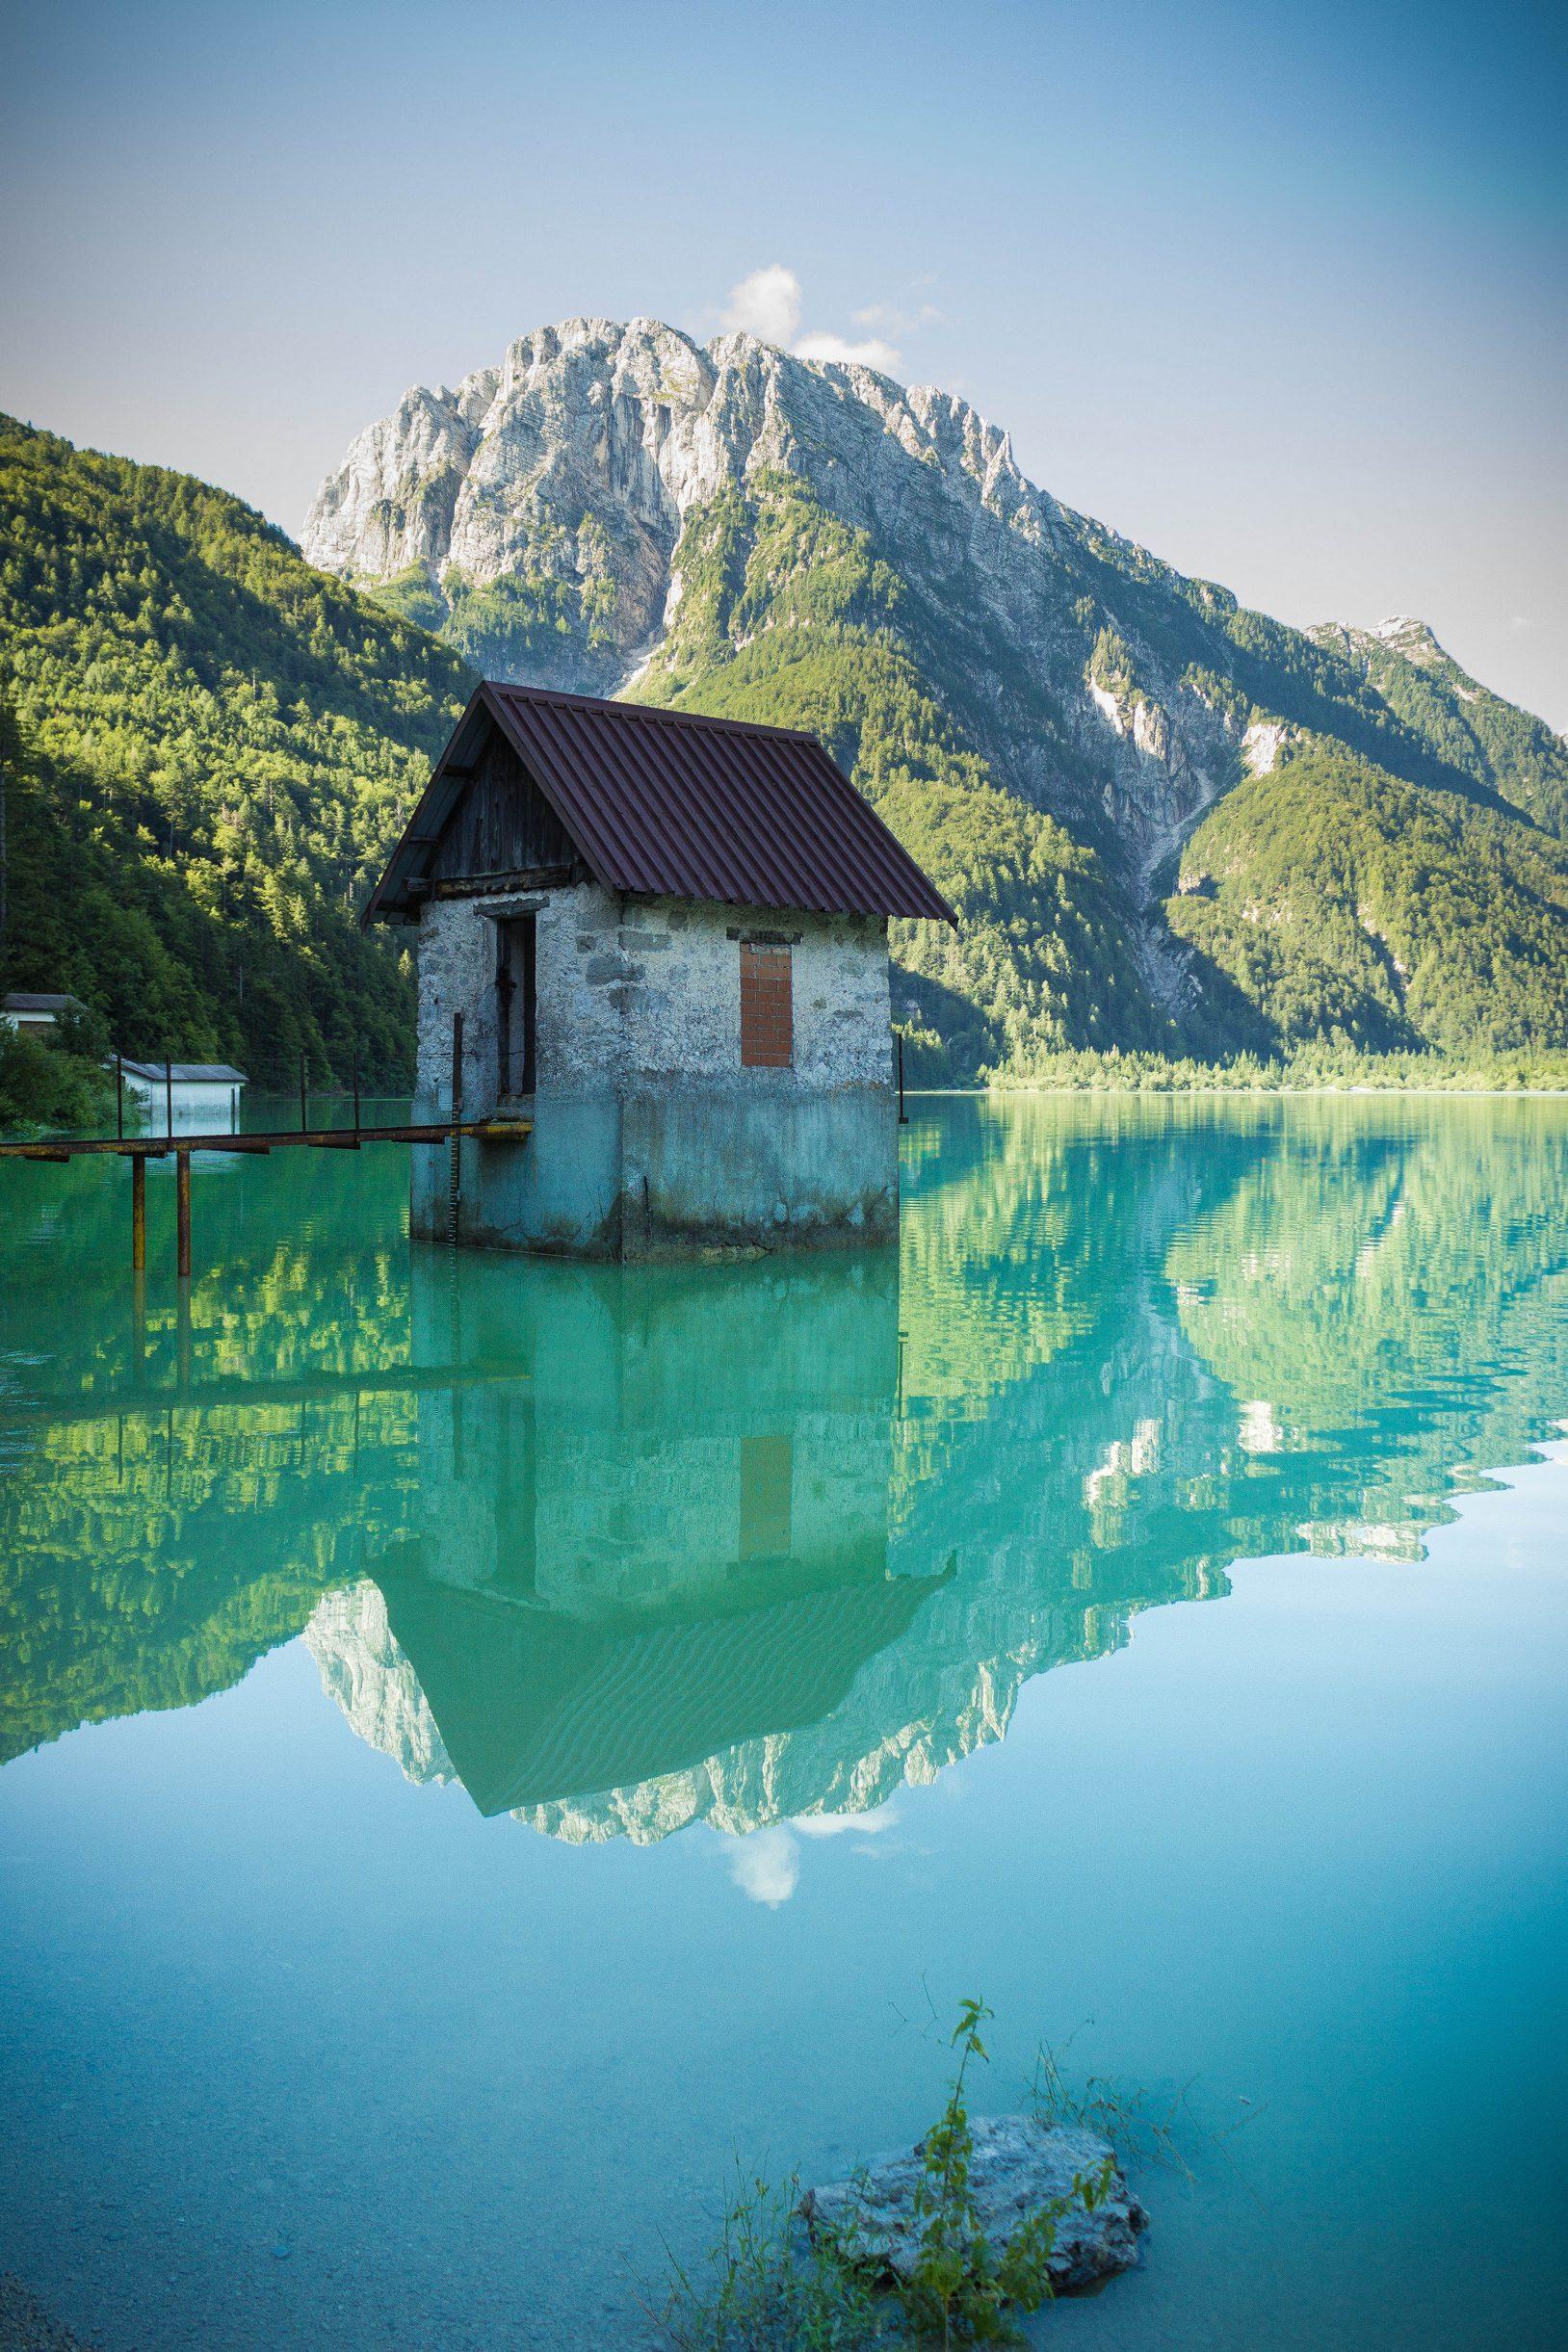 lake travel reflection summer sky mountain wood landscape house